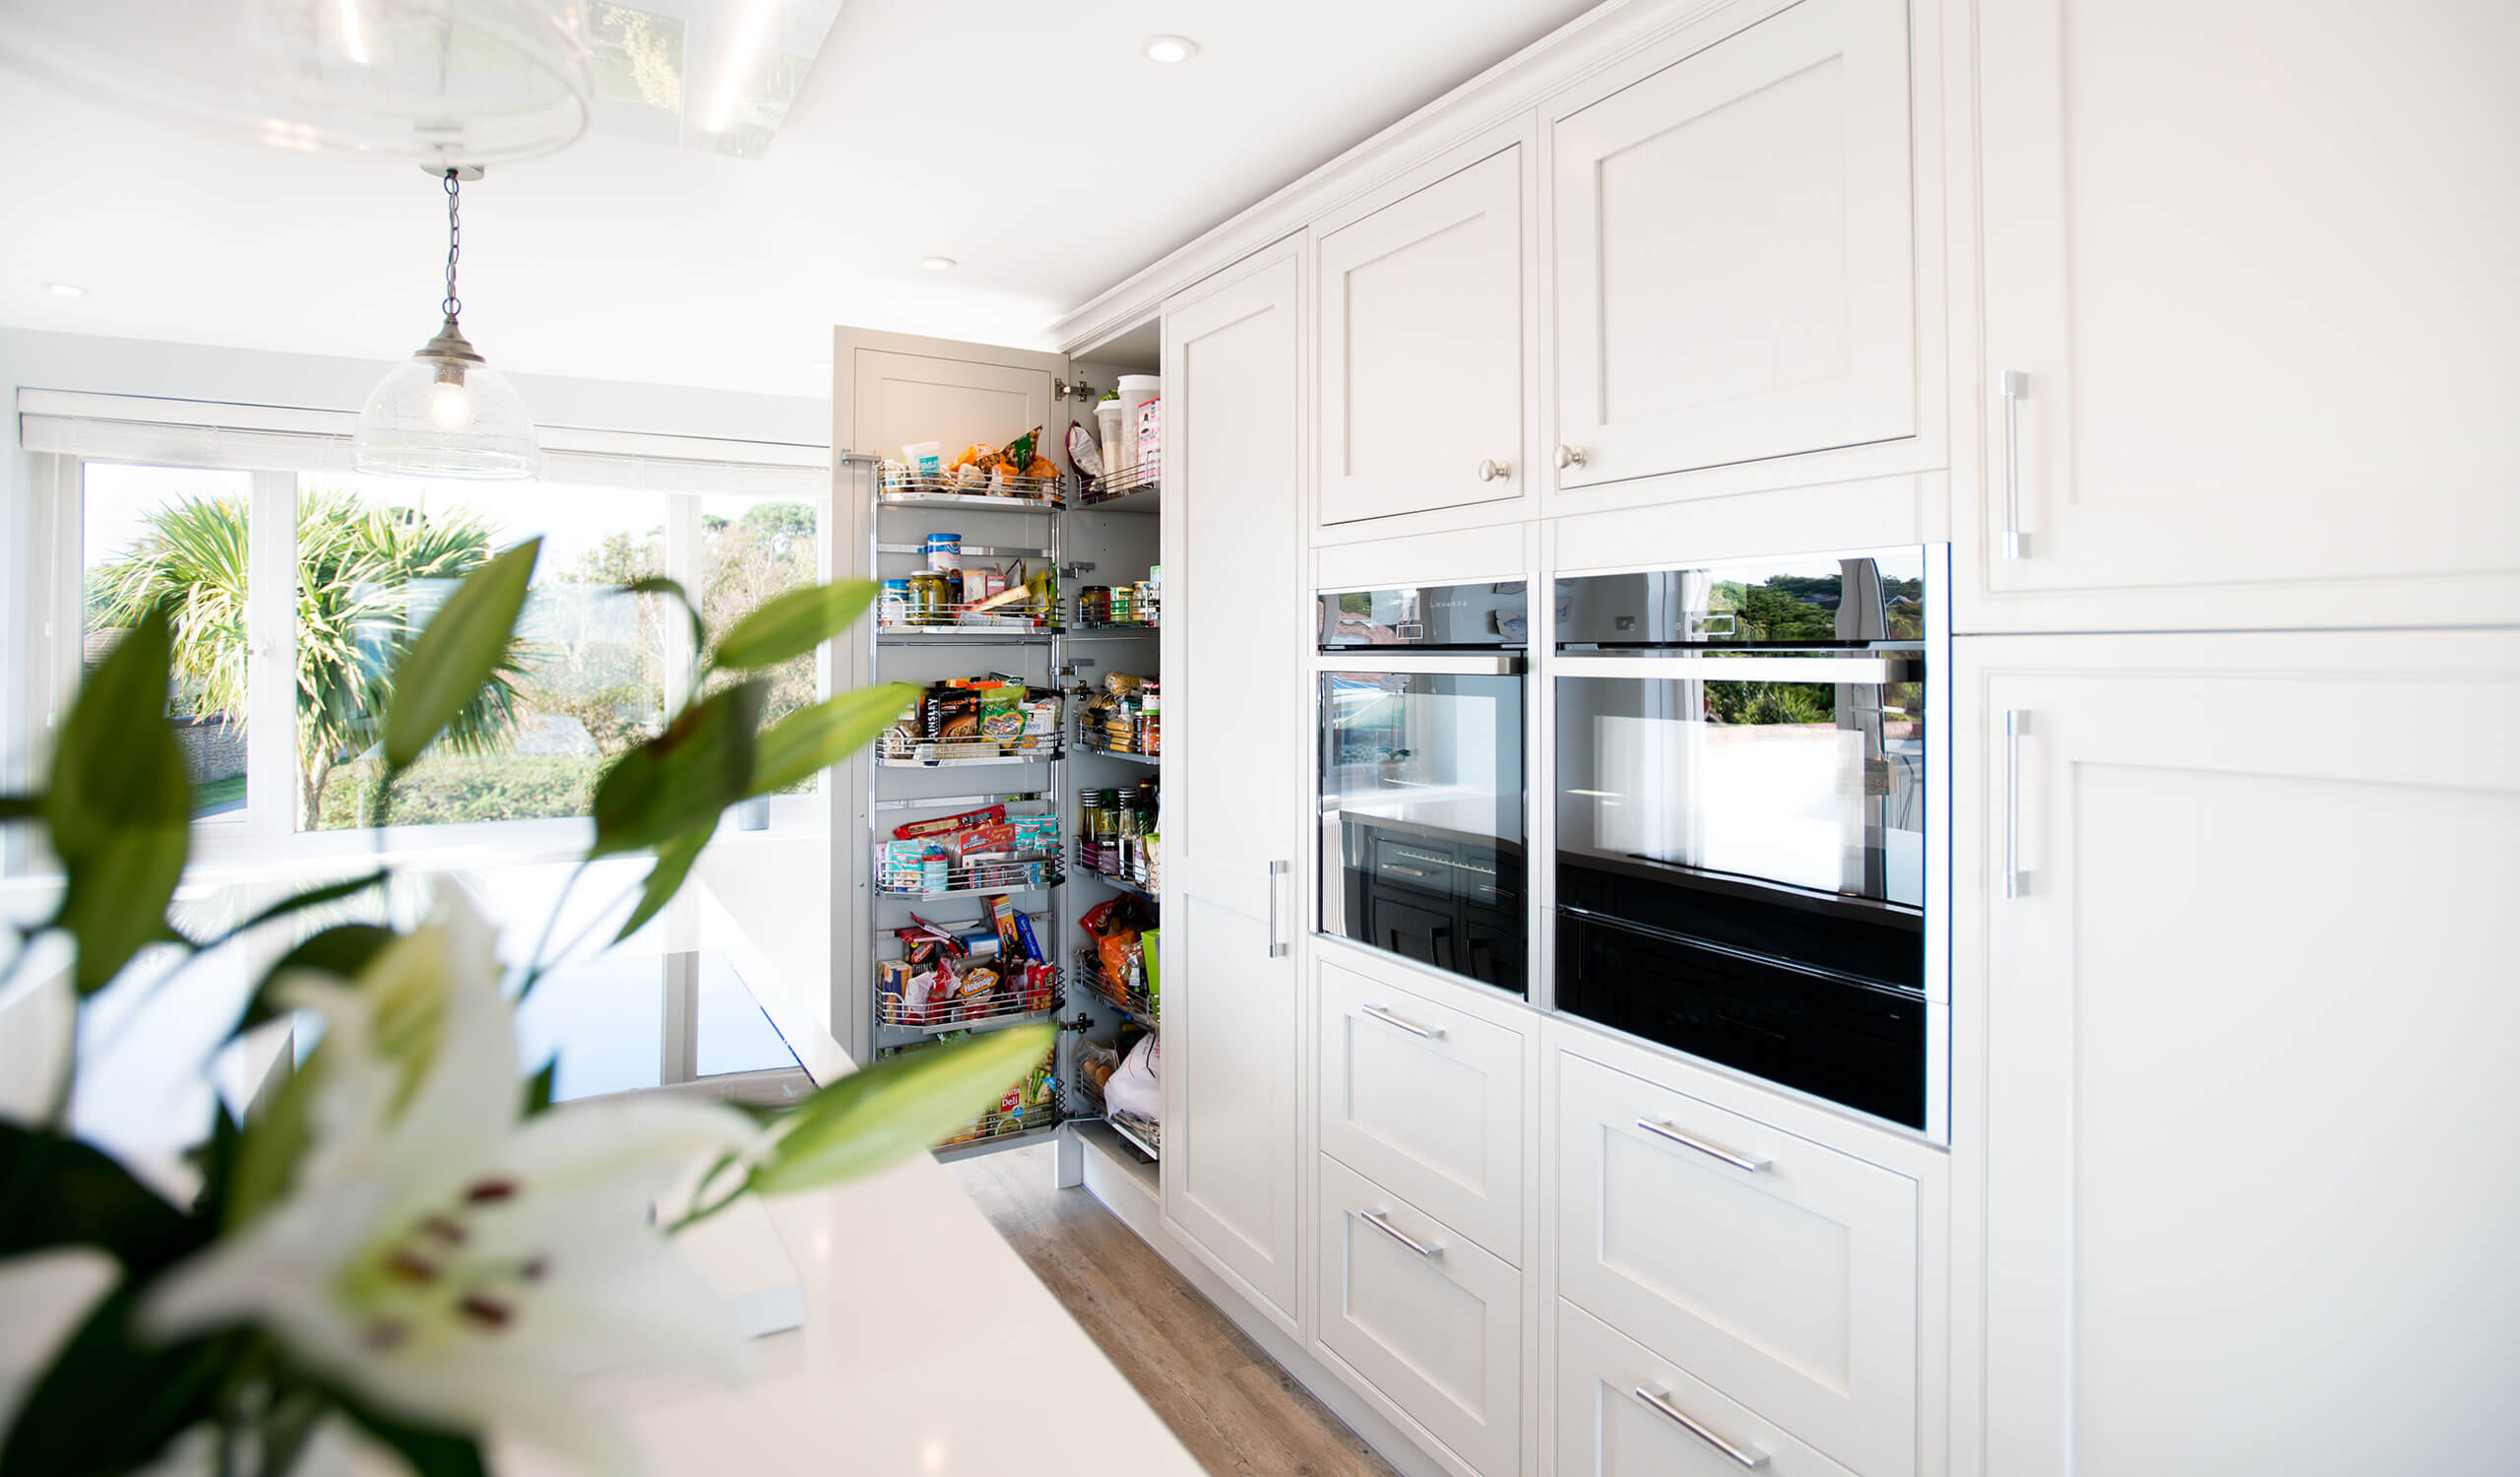 bespoke modern kitchen cooking appliances